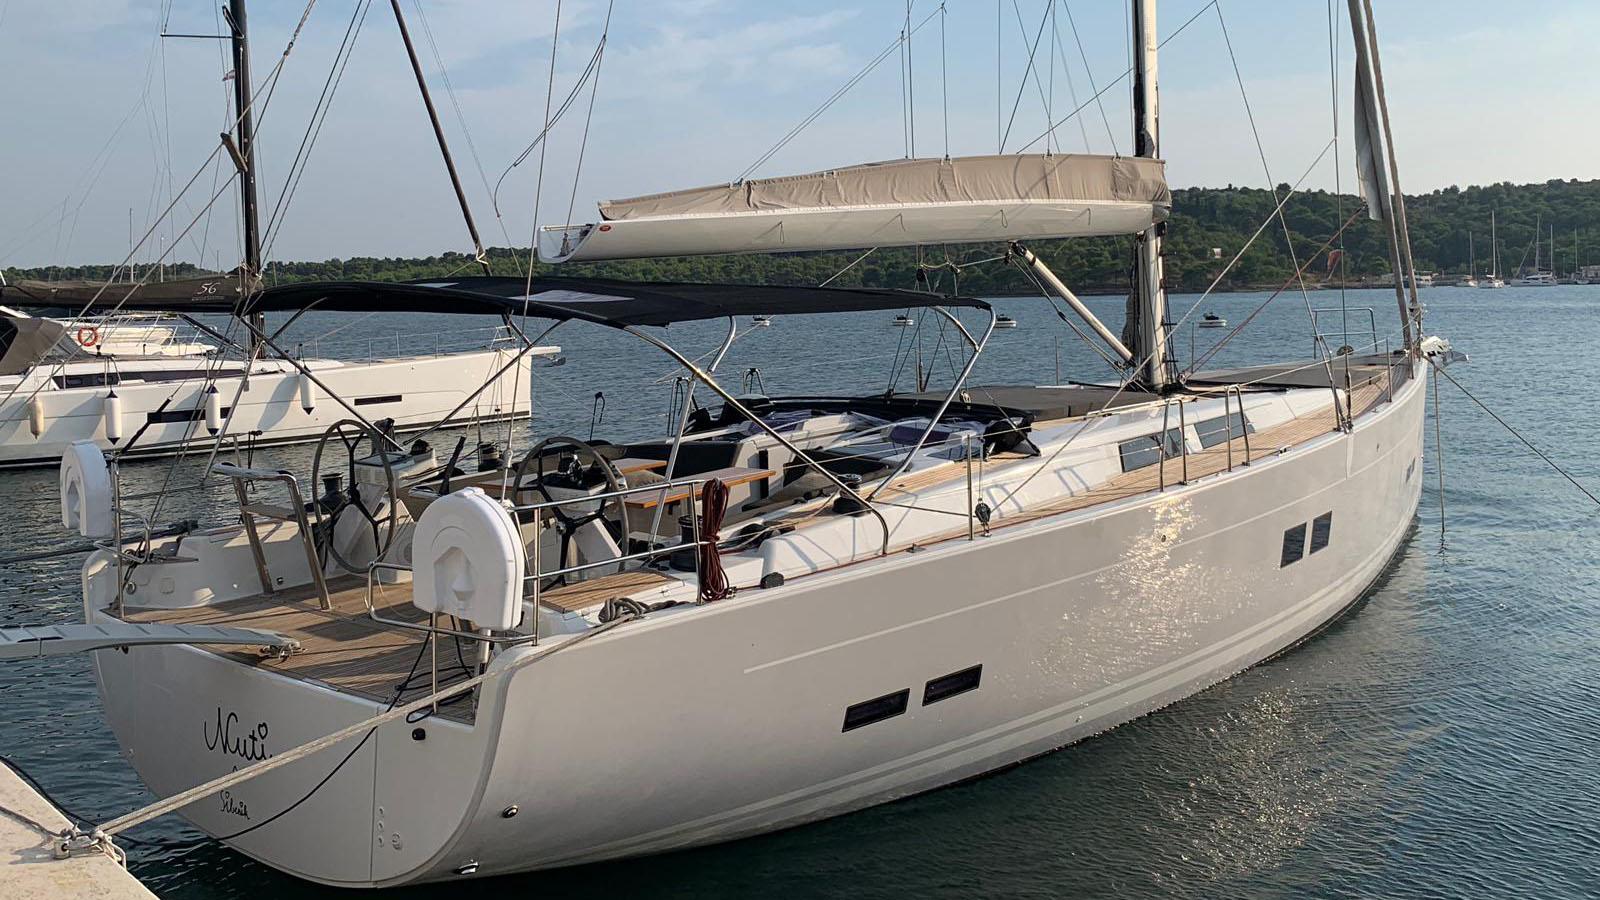 Nuti Yacht for Sale - IYC